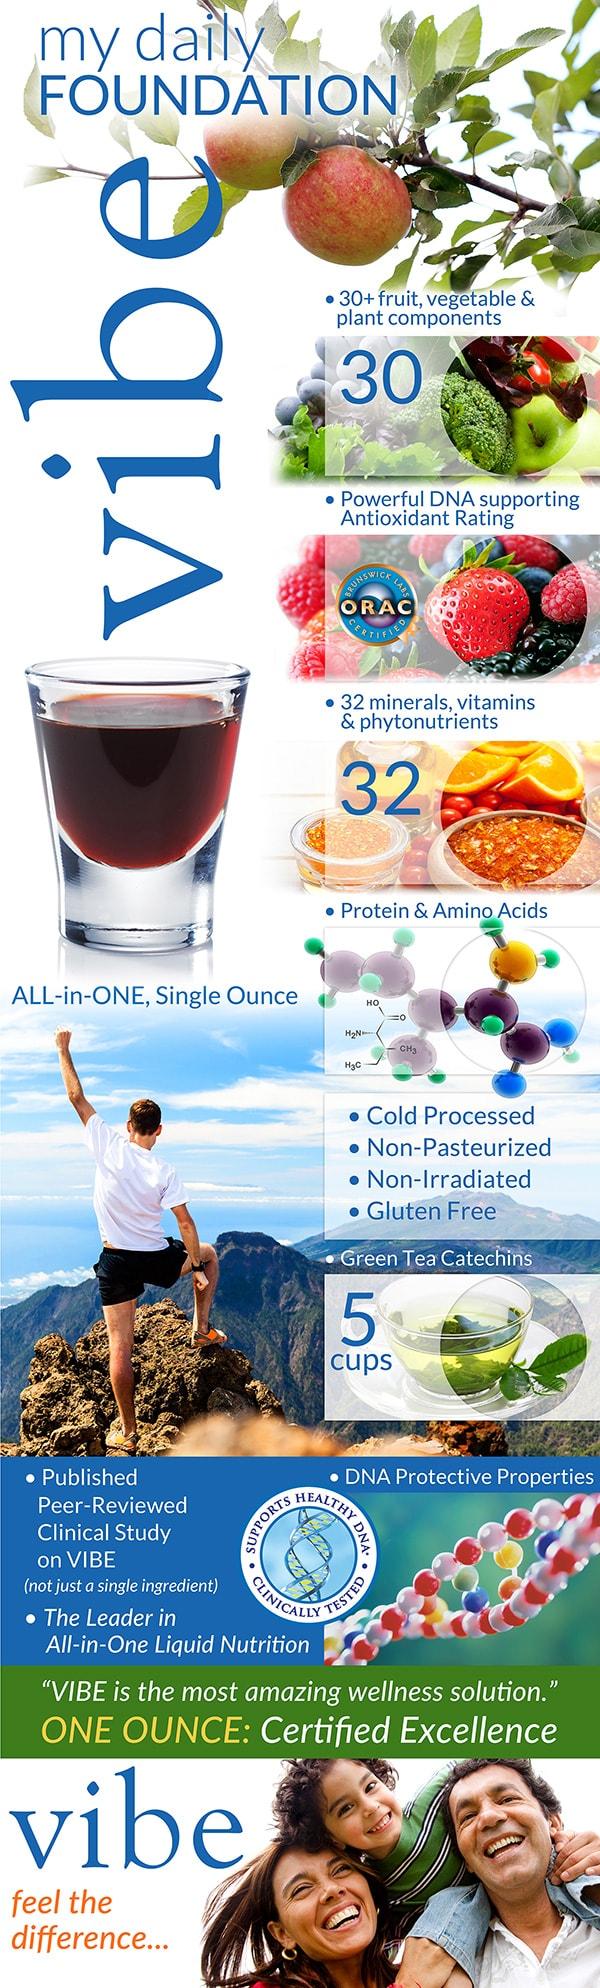 Eniva Vibe Fruit Flavor Liquid Multi Vitamin, Daily Immune Health - Elderberry, Zinc, Vitamin C, Green Tea, Antioxidants, DNA Protection